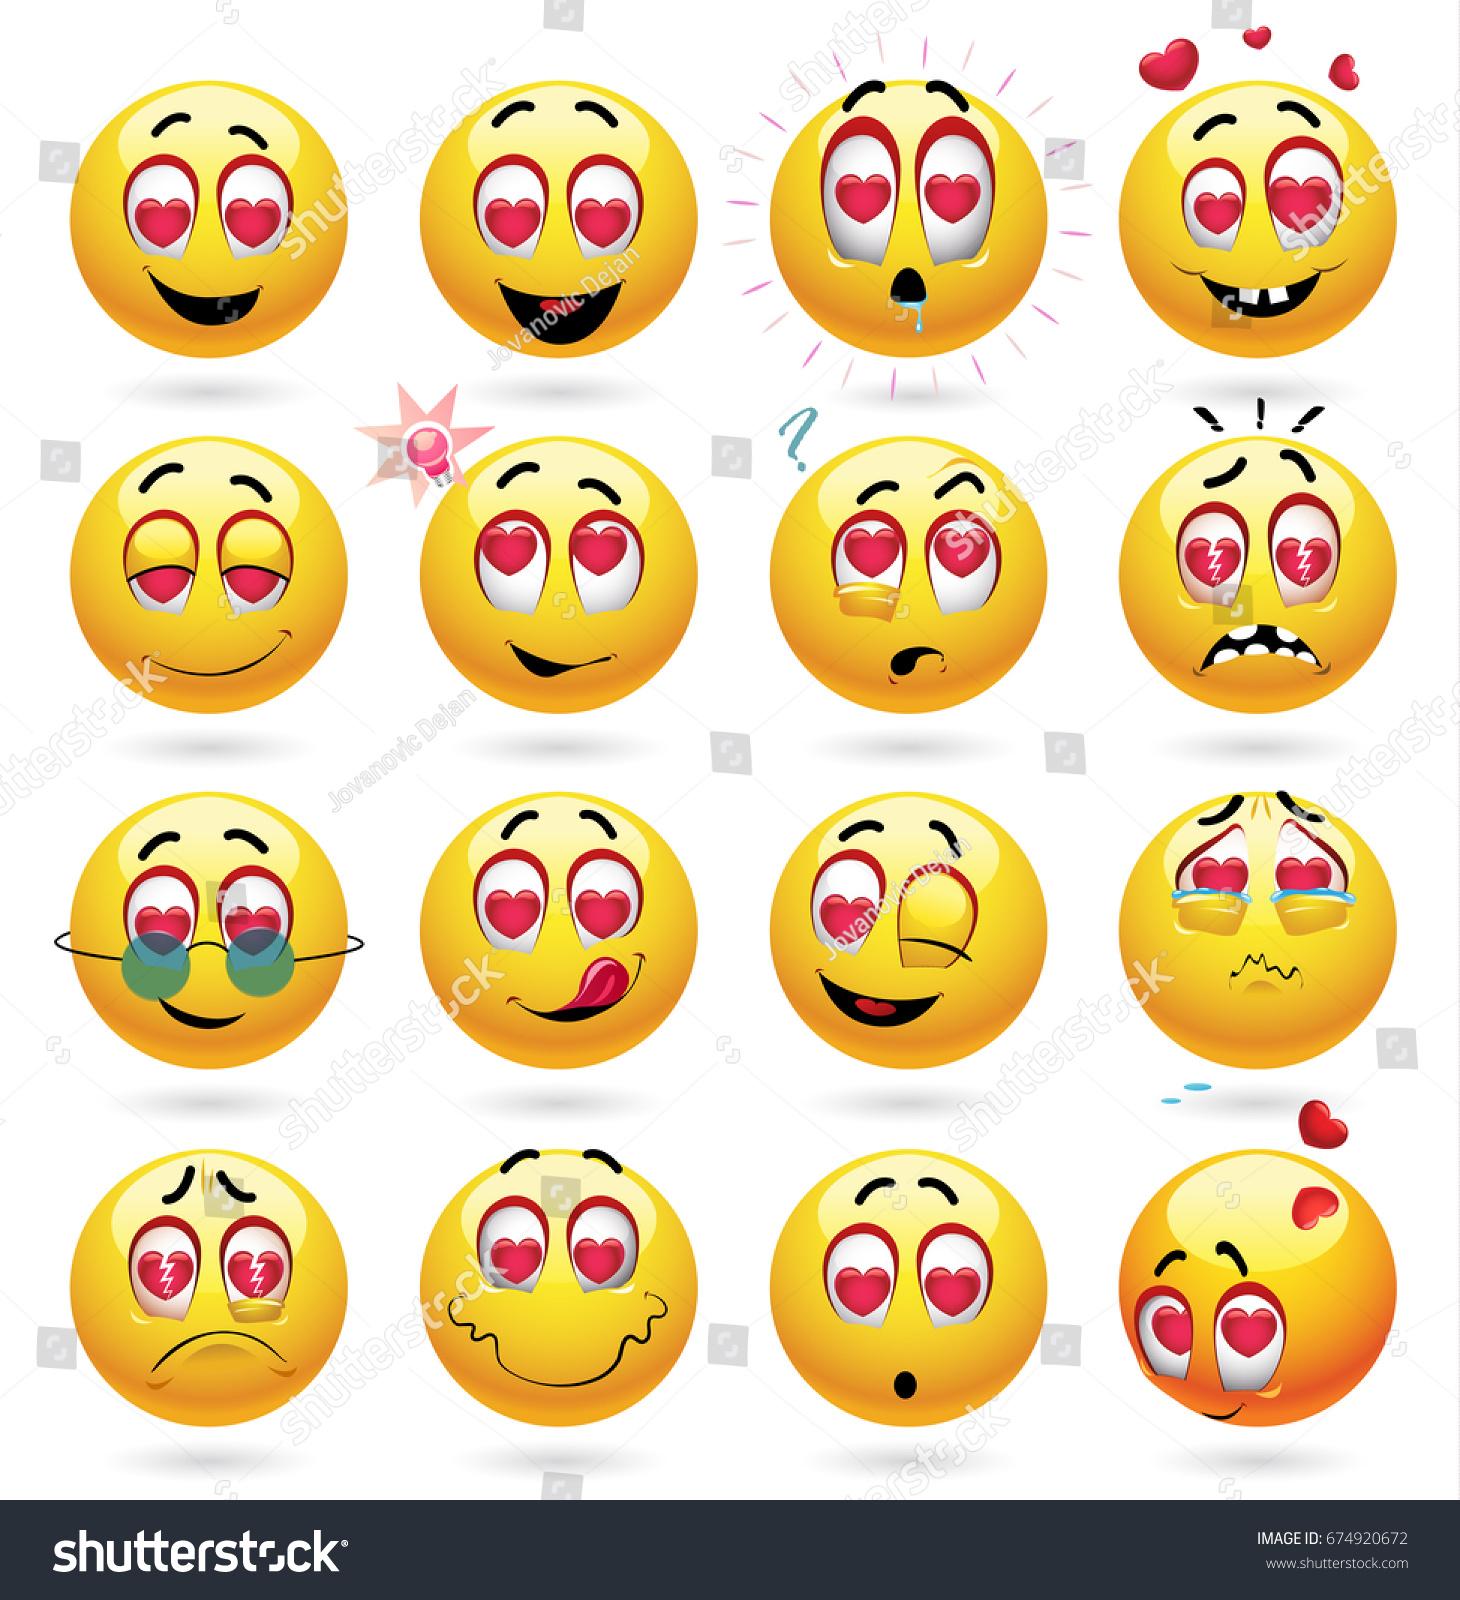 Cute Smiley Emoji Feeling Love Vector Stock Vector 674920672